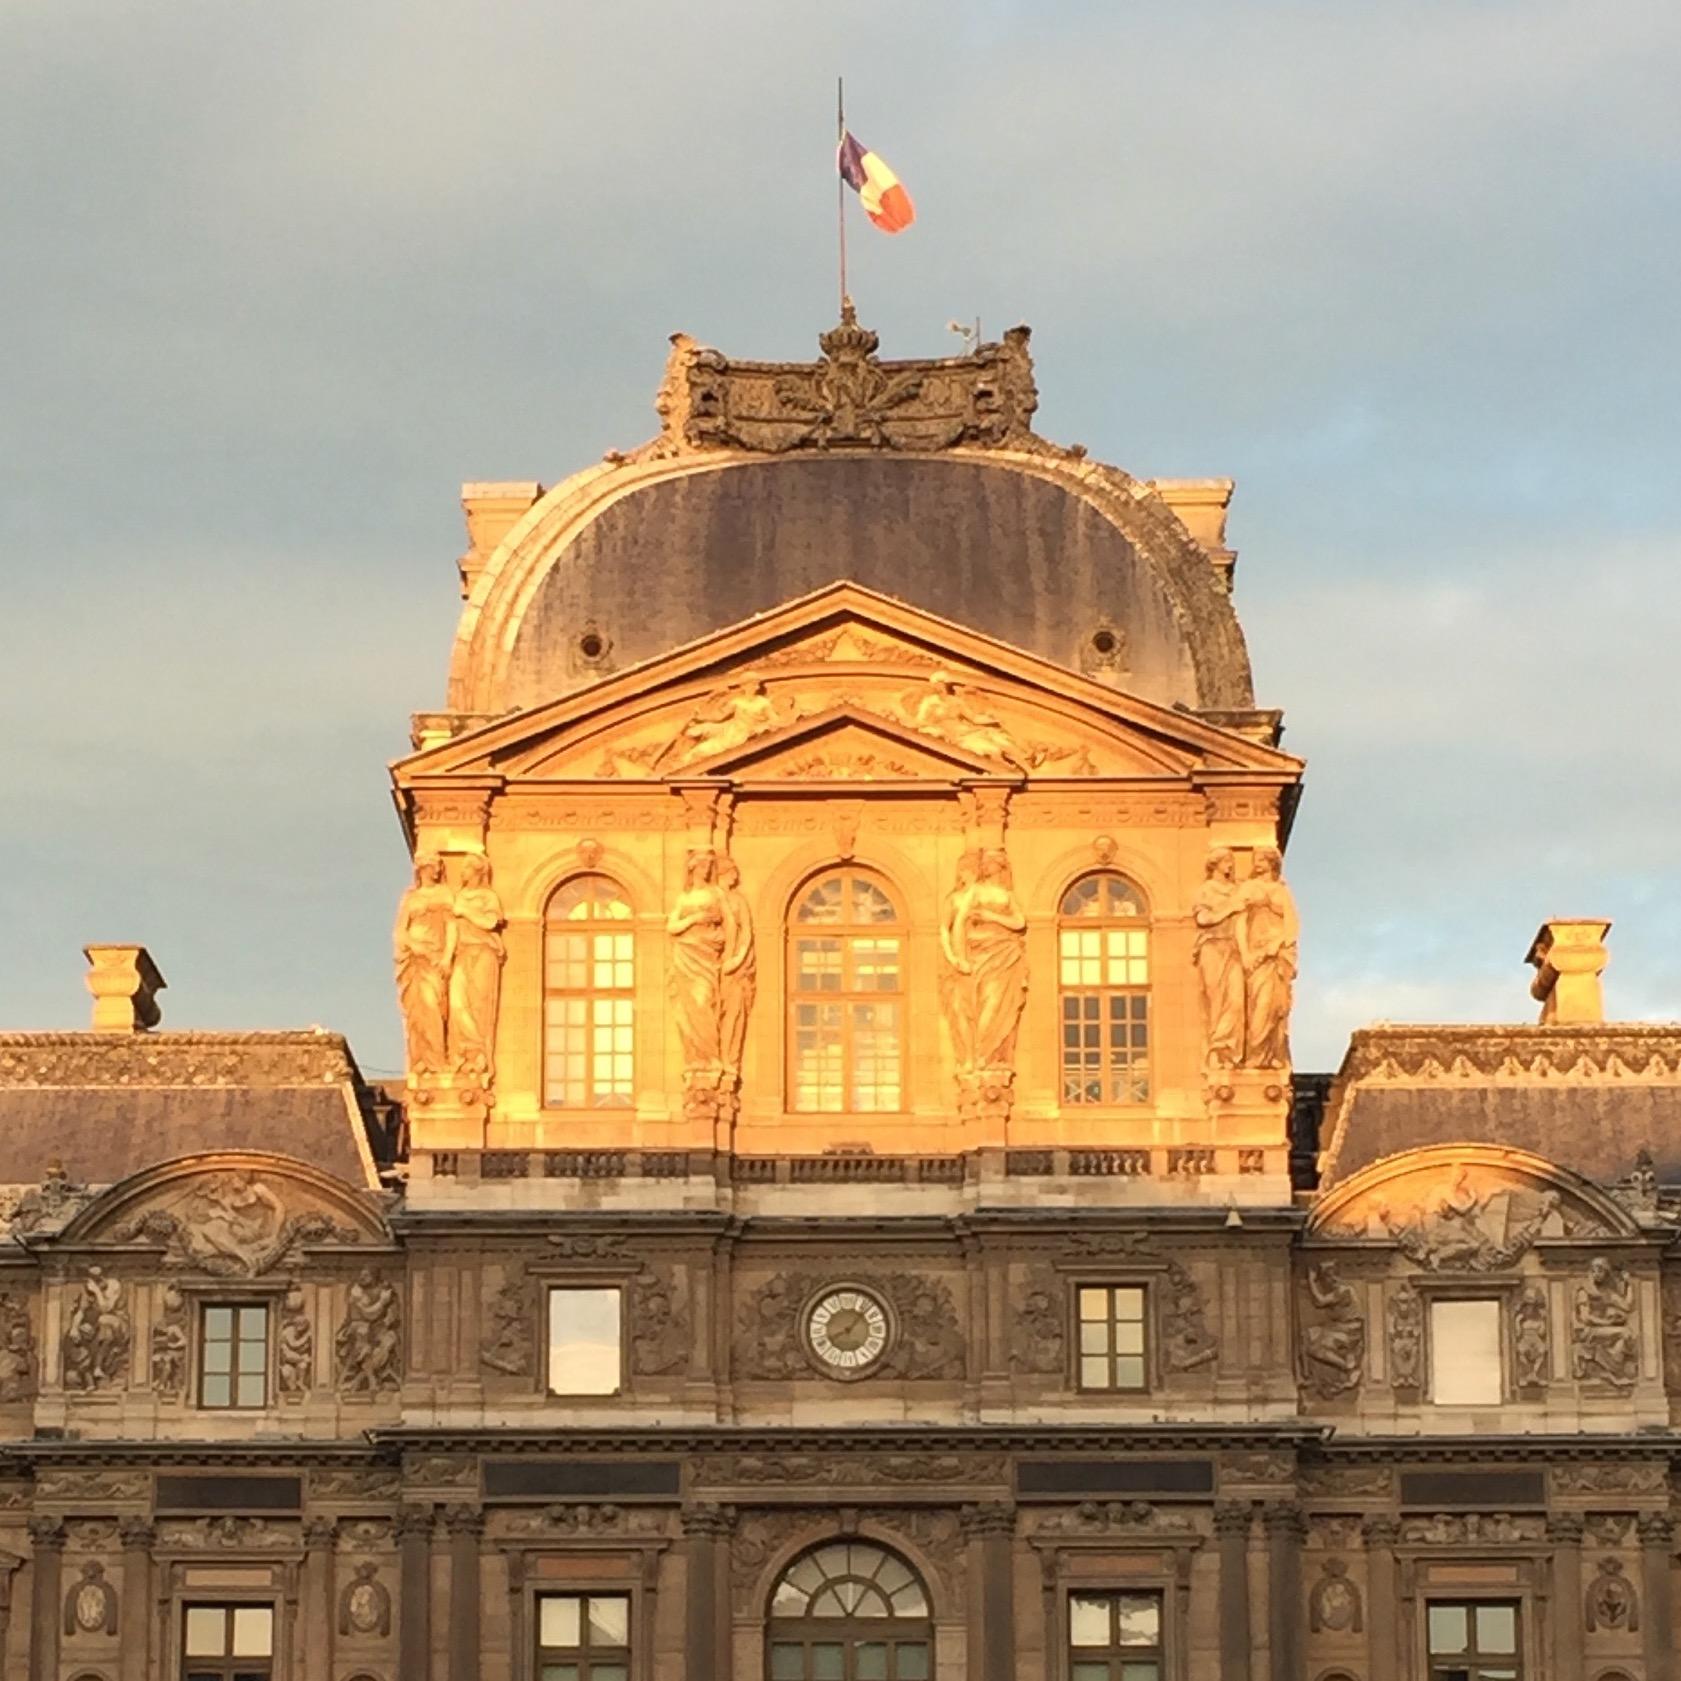 Pavillon-de-lHorloge-Flag